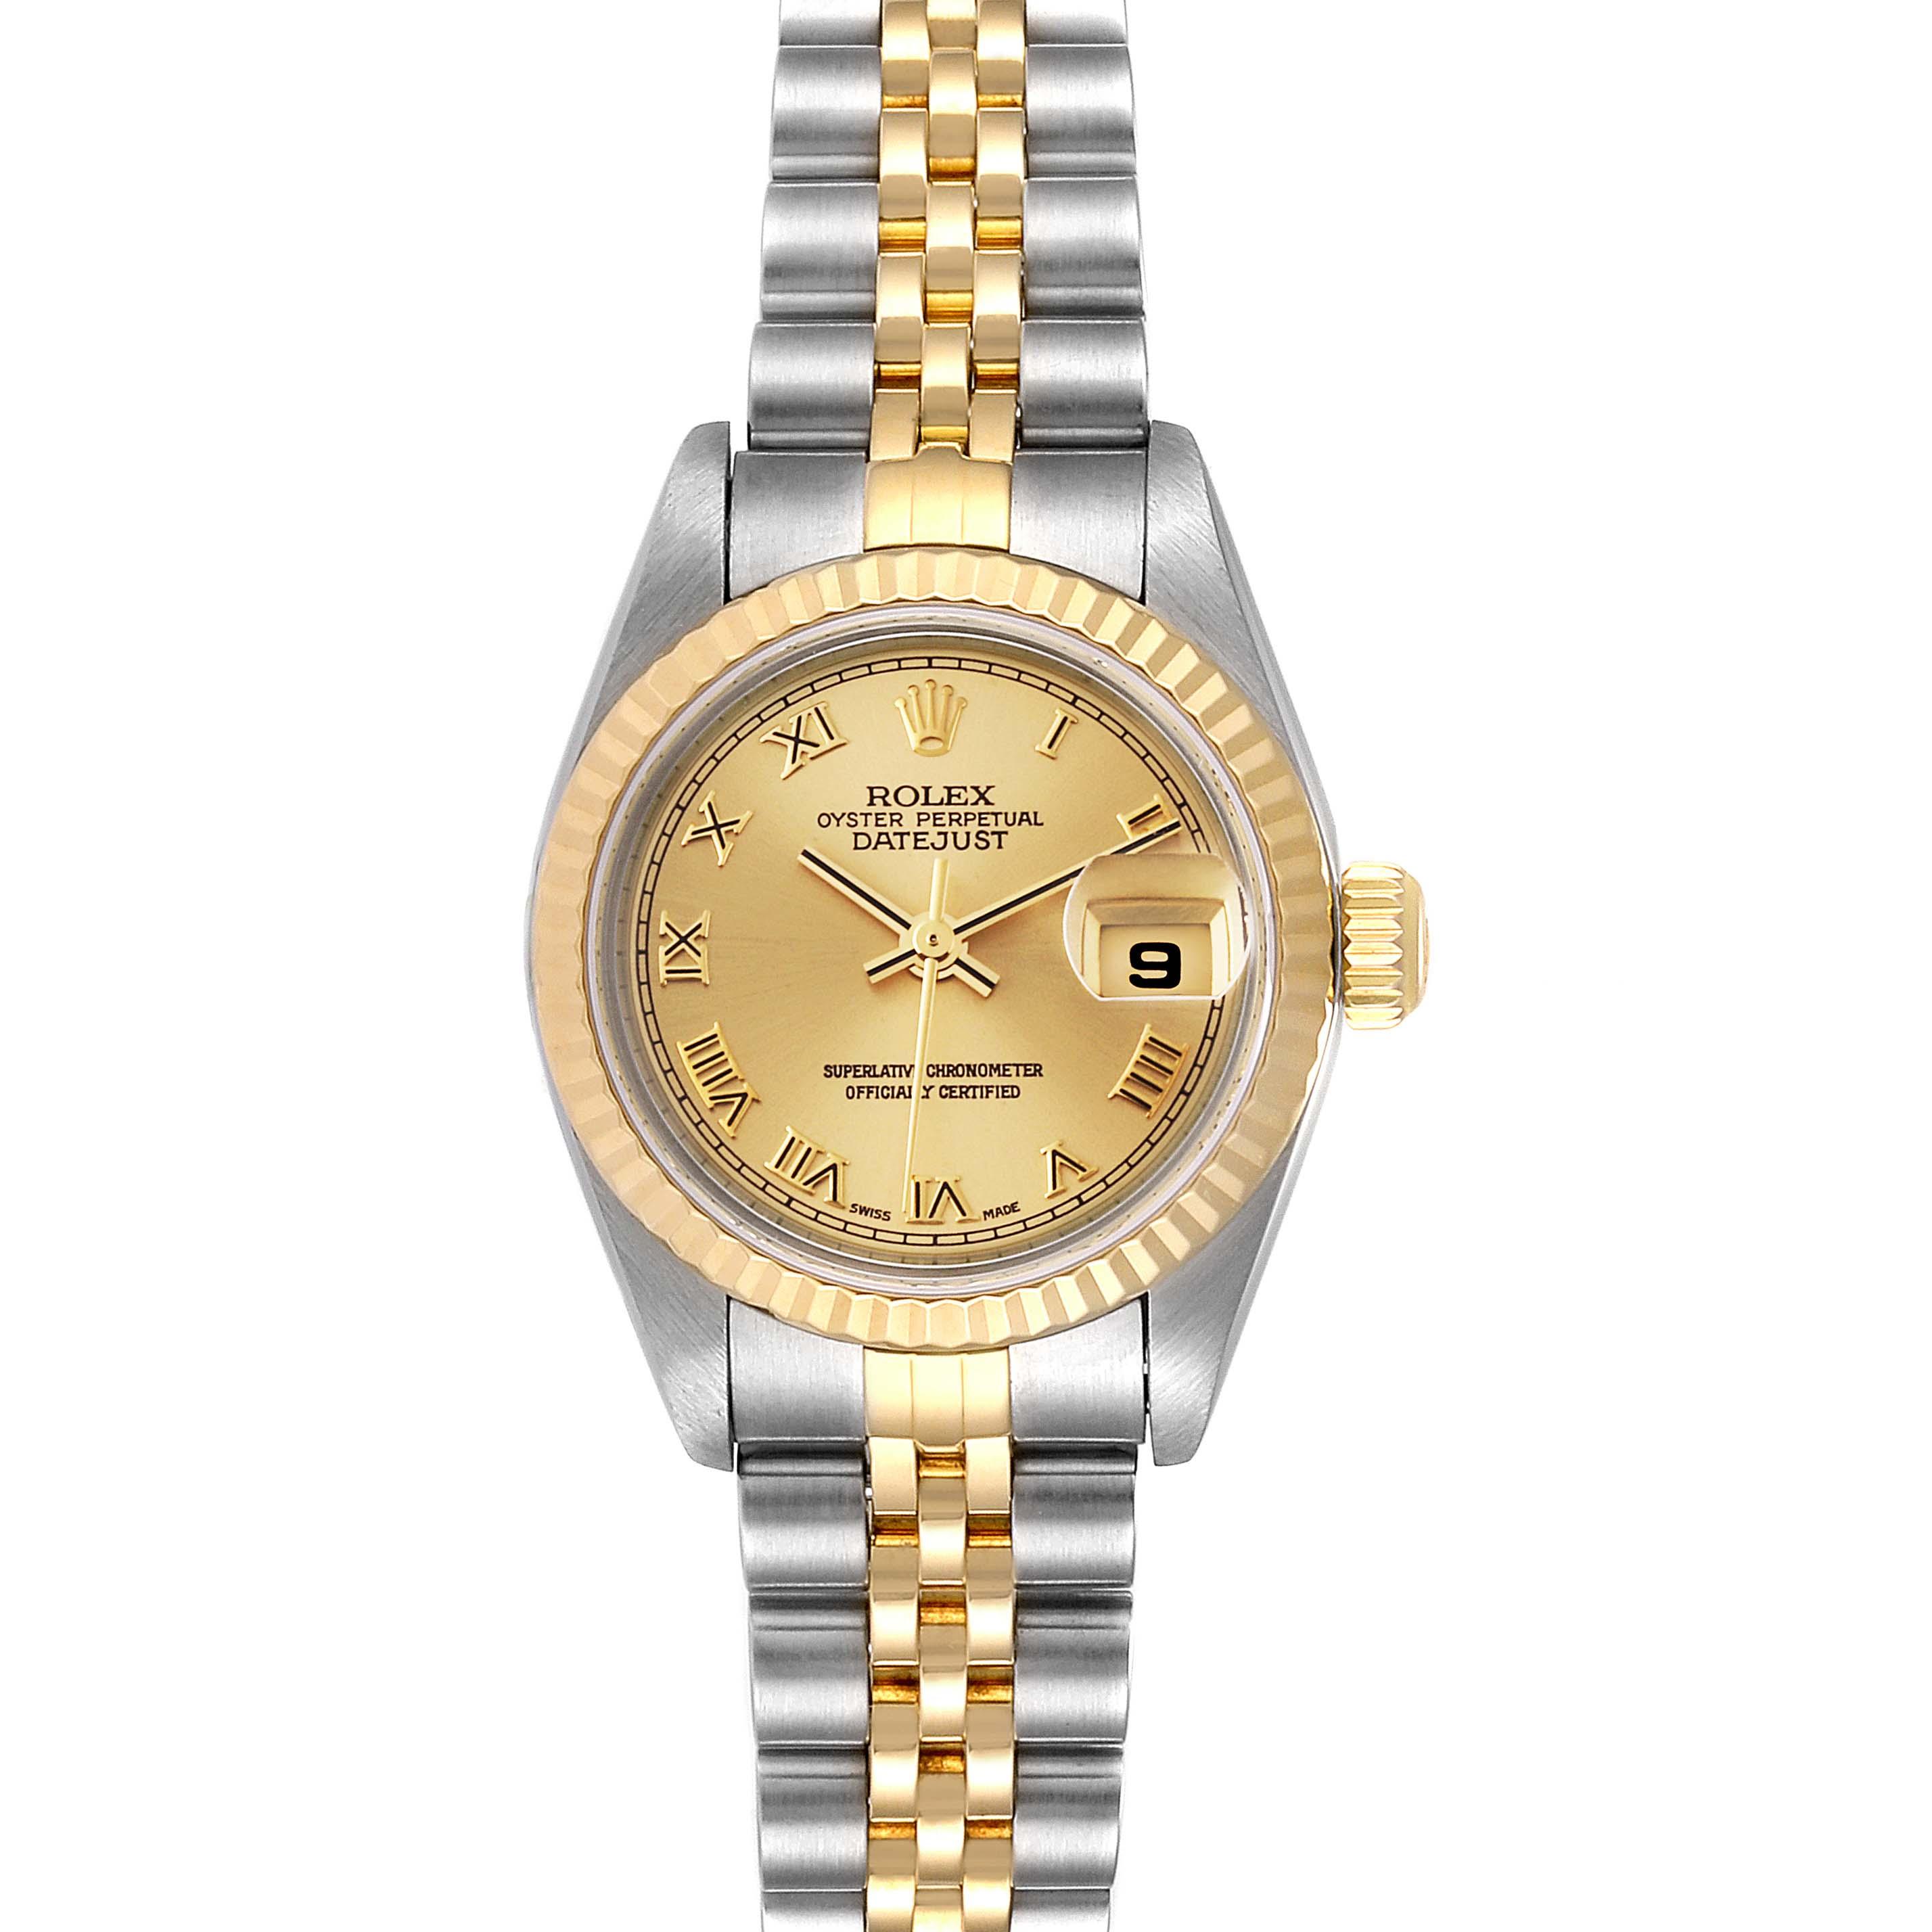 Rolex Datejust Steel 18K Yellow Gold Fluted Bezel Ladies Watch 79173